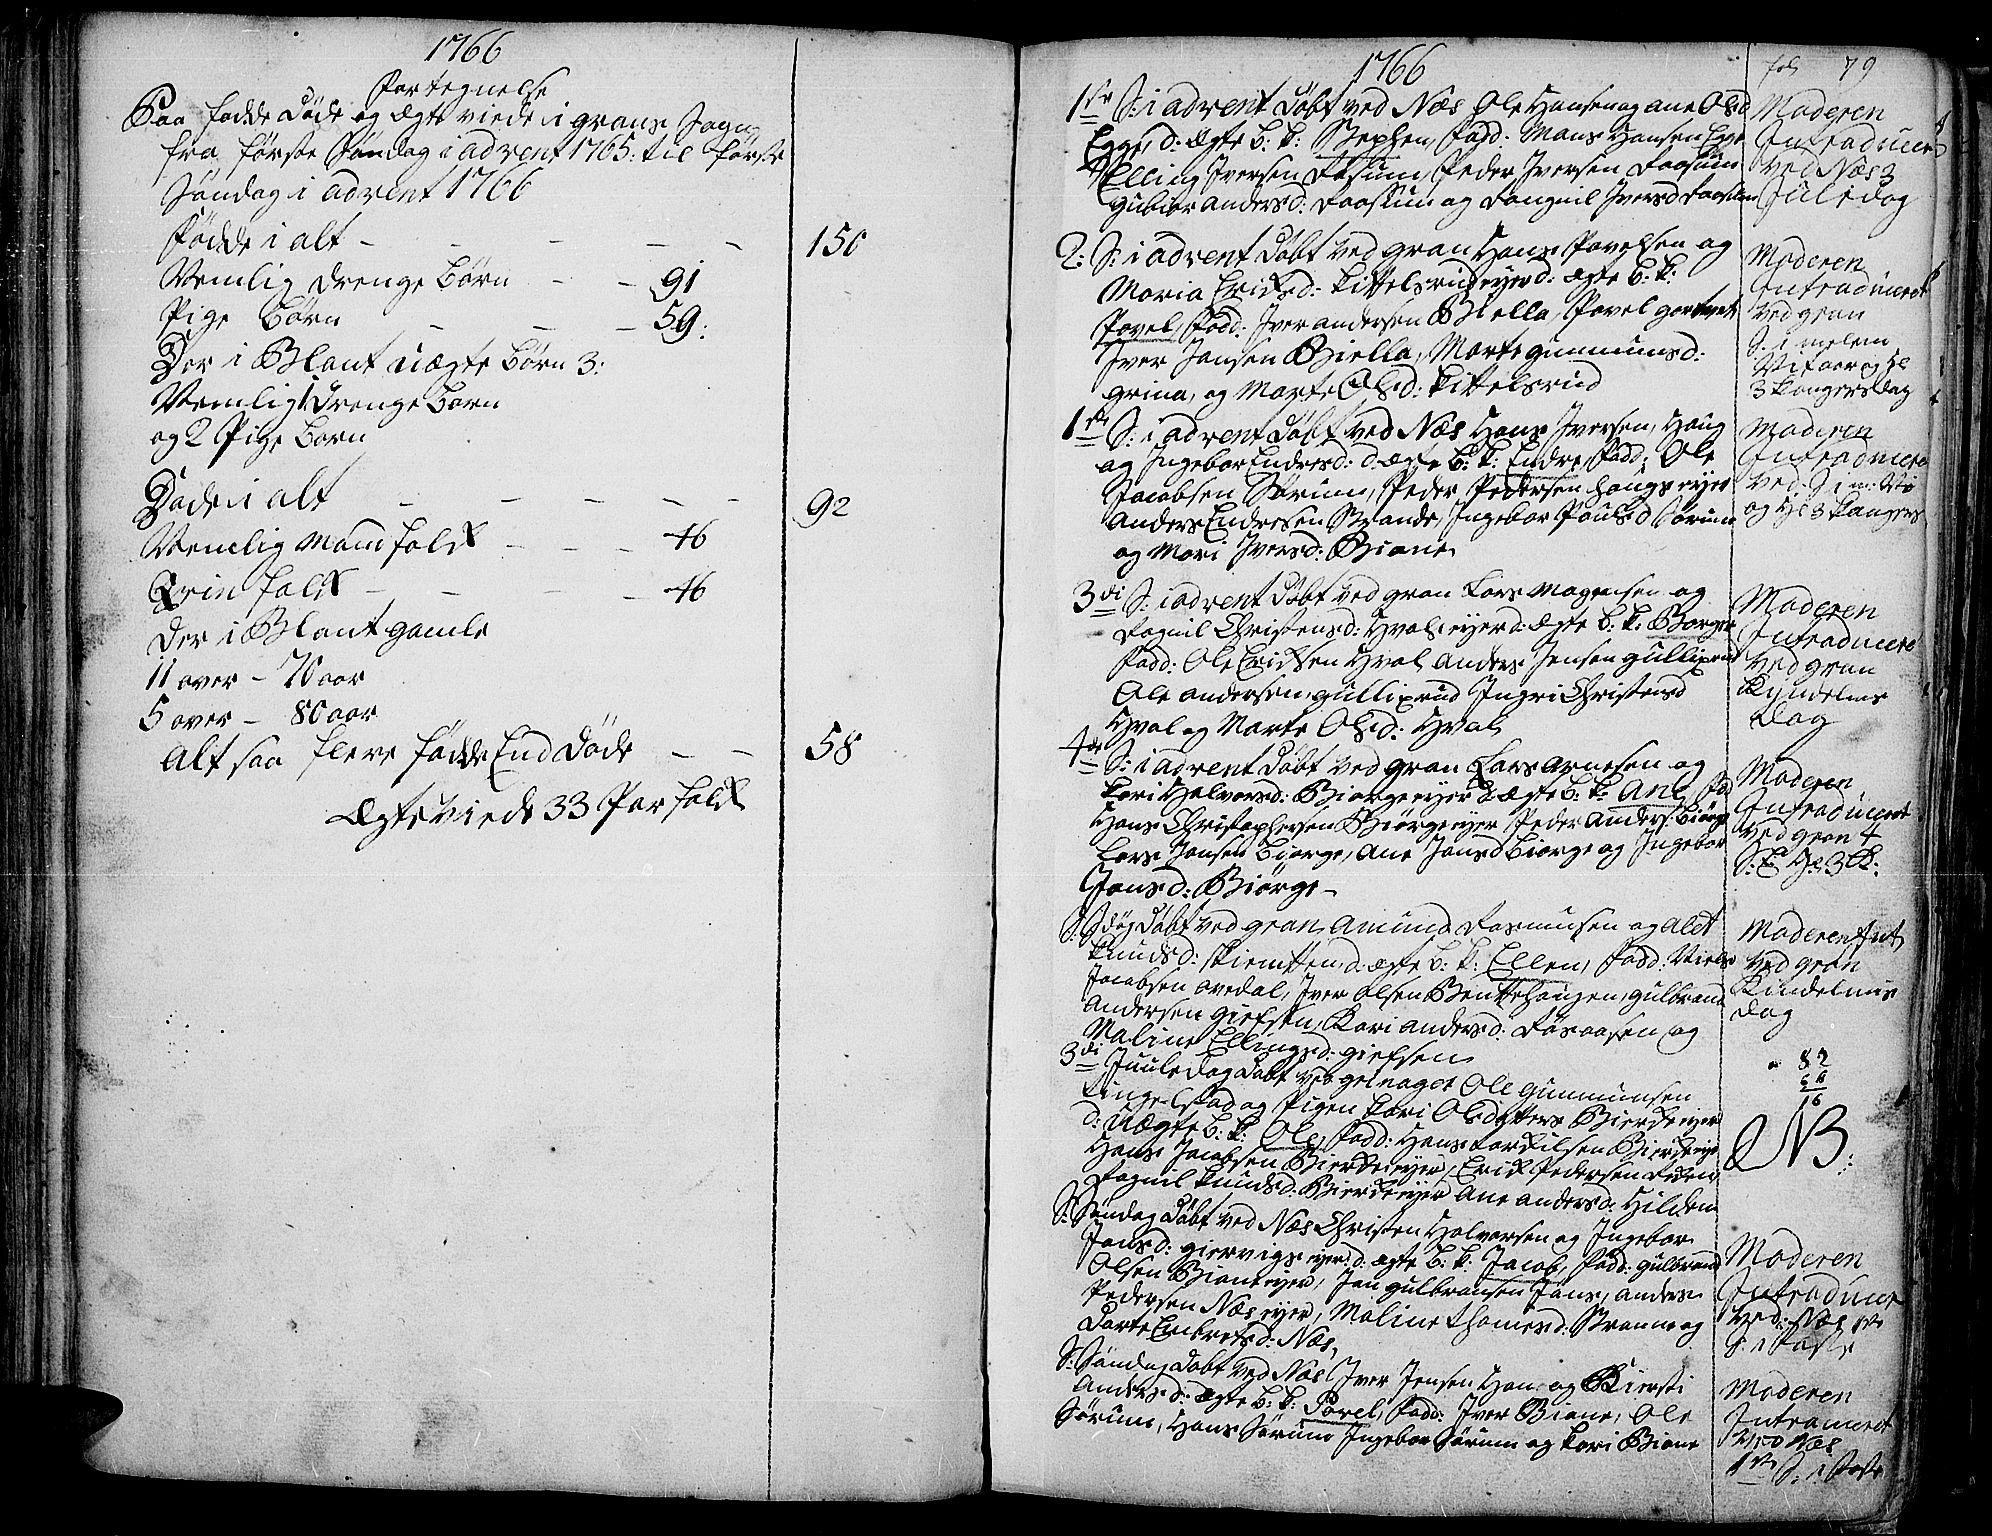 SAH, Gran prestekontor, Ministerialbok nr. 4, 1759-1775, s. 79